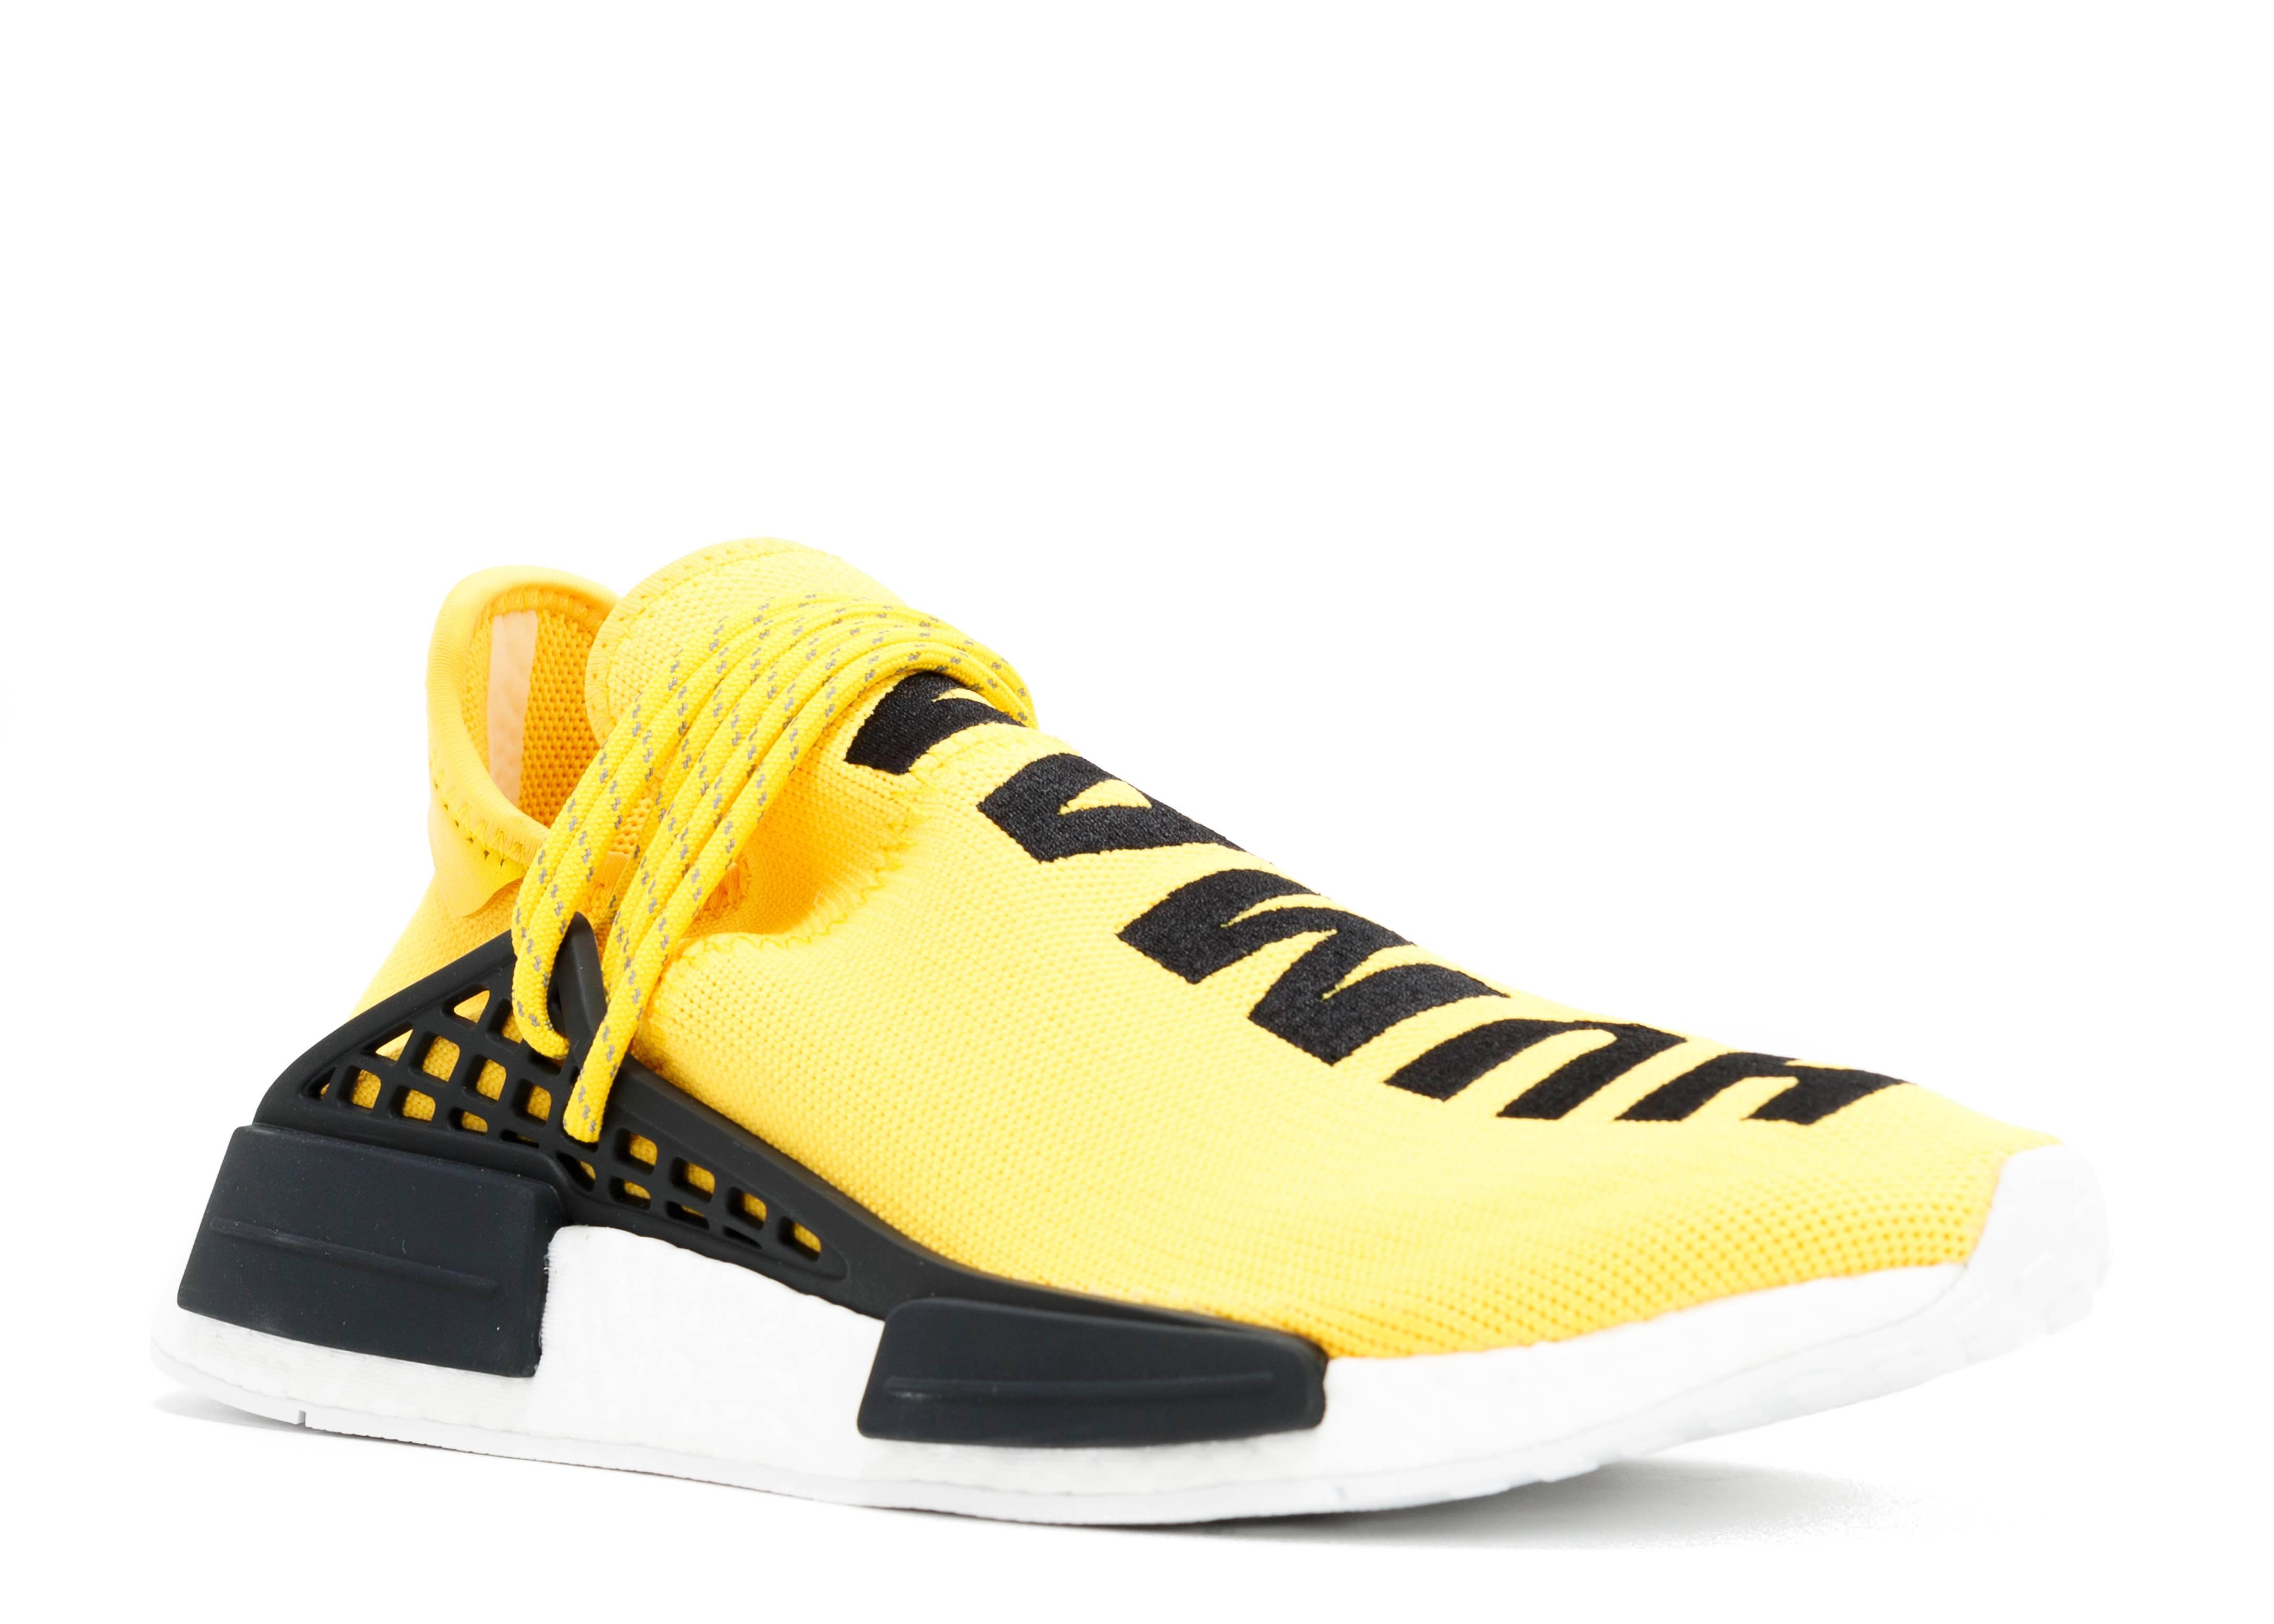 calidad autentica comprar baratas mirada detallada Pharrell X NMD Human Race 'Yellow' - Adidas - BB0619 - yellow/black |  Flight Club